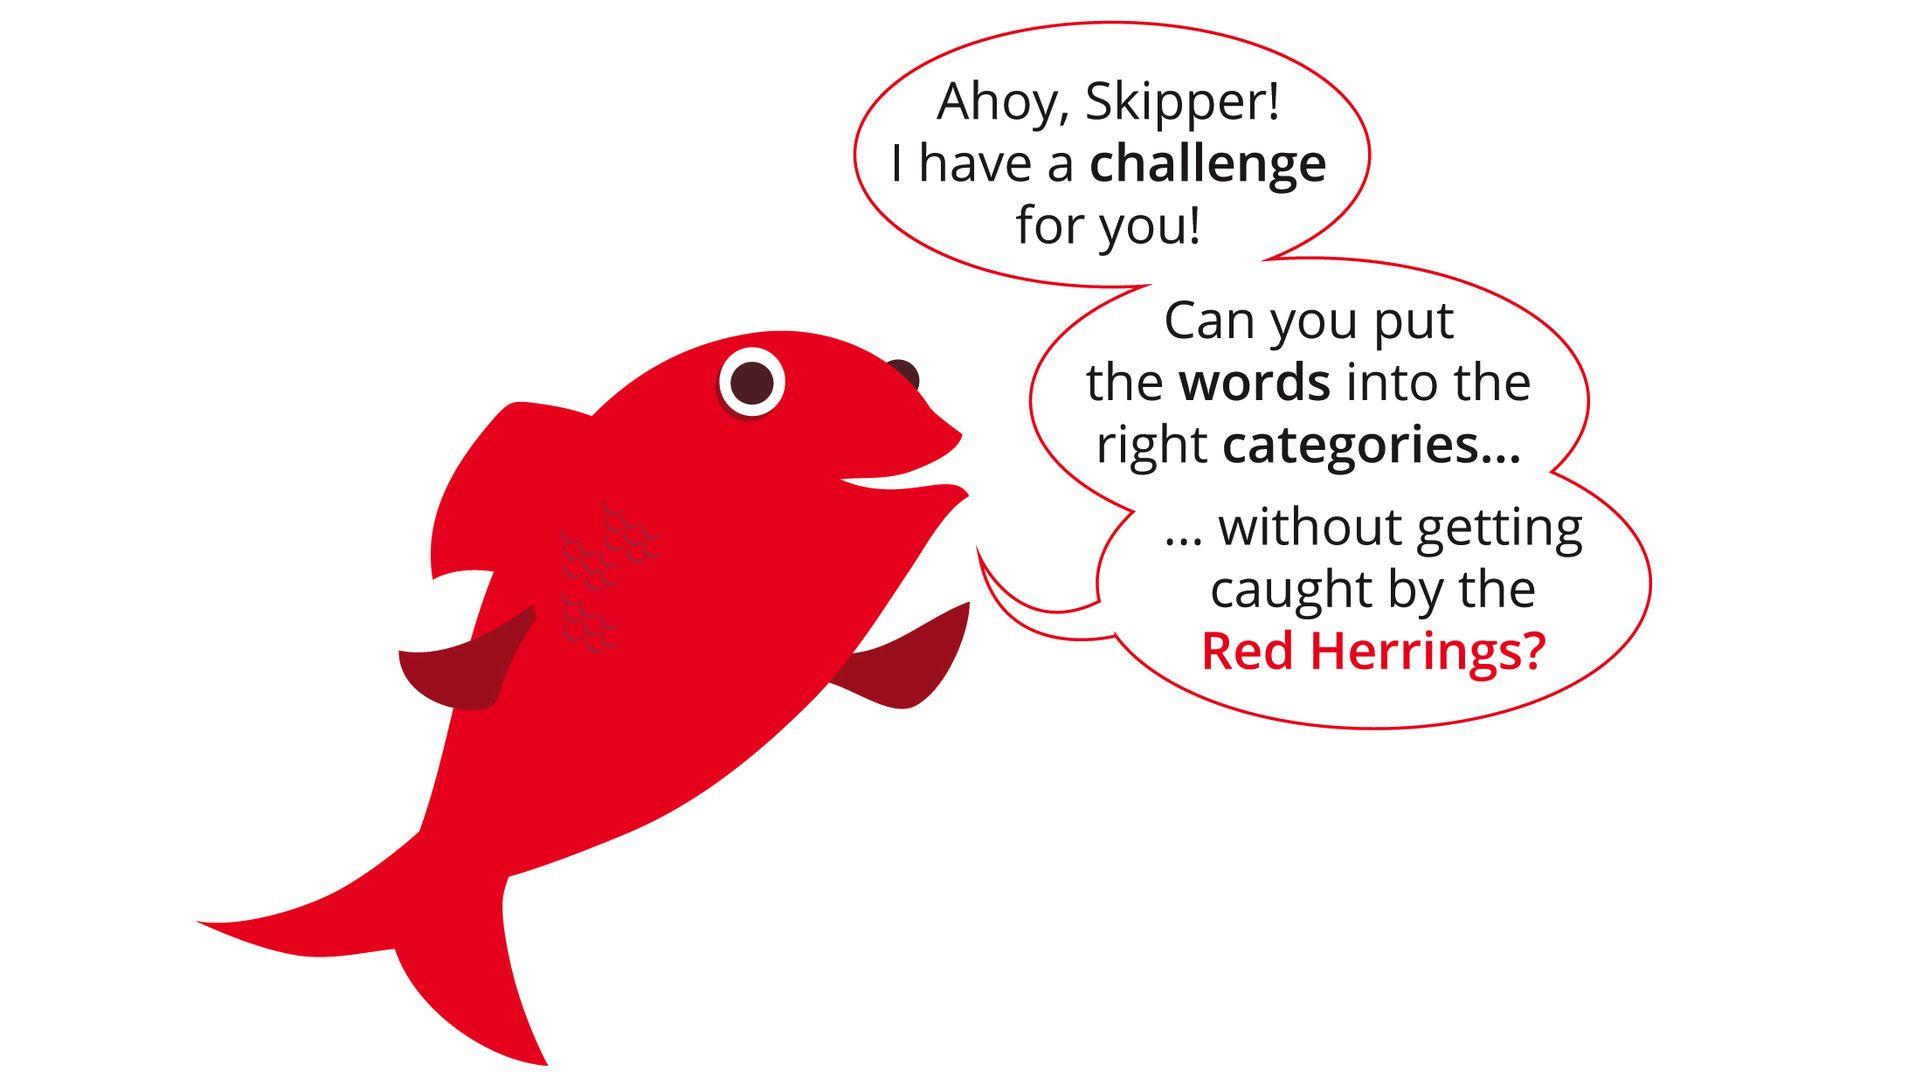 Red Herring WordGamesPuzzleios Education blog, Red